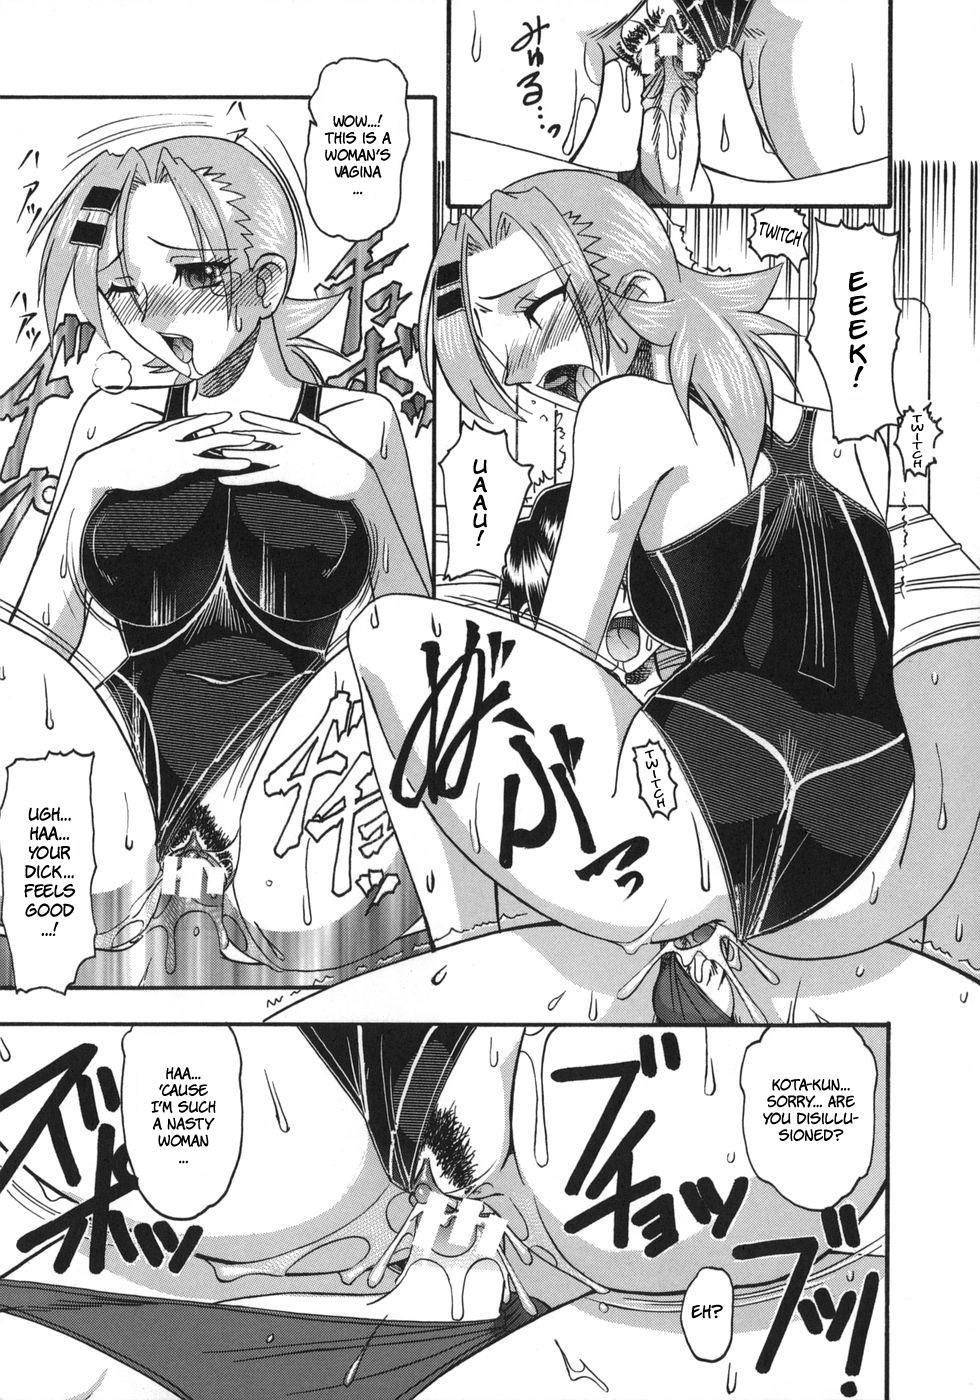 Hadaka Yori Hiwai - She is dirtier than nakedness 160